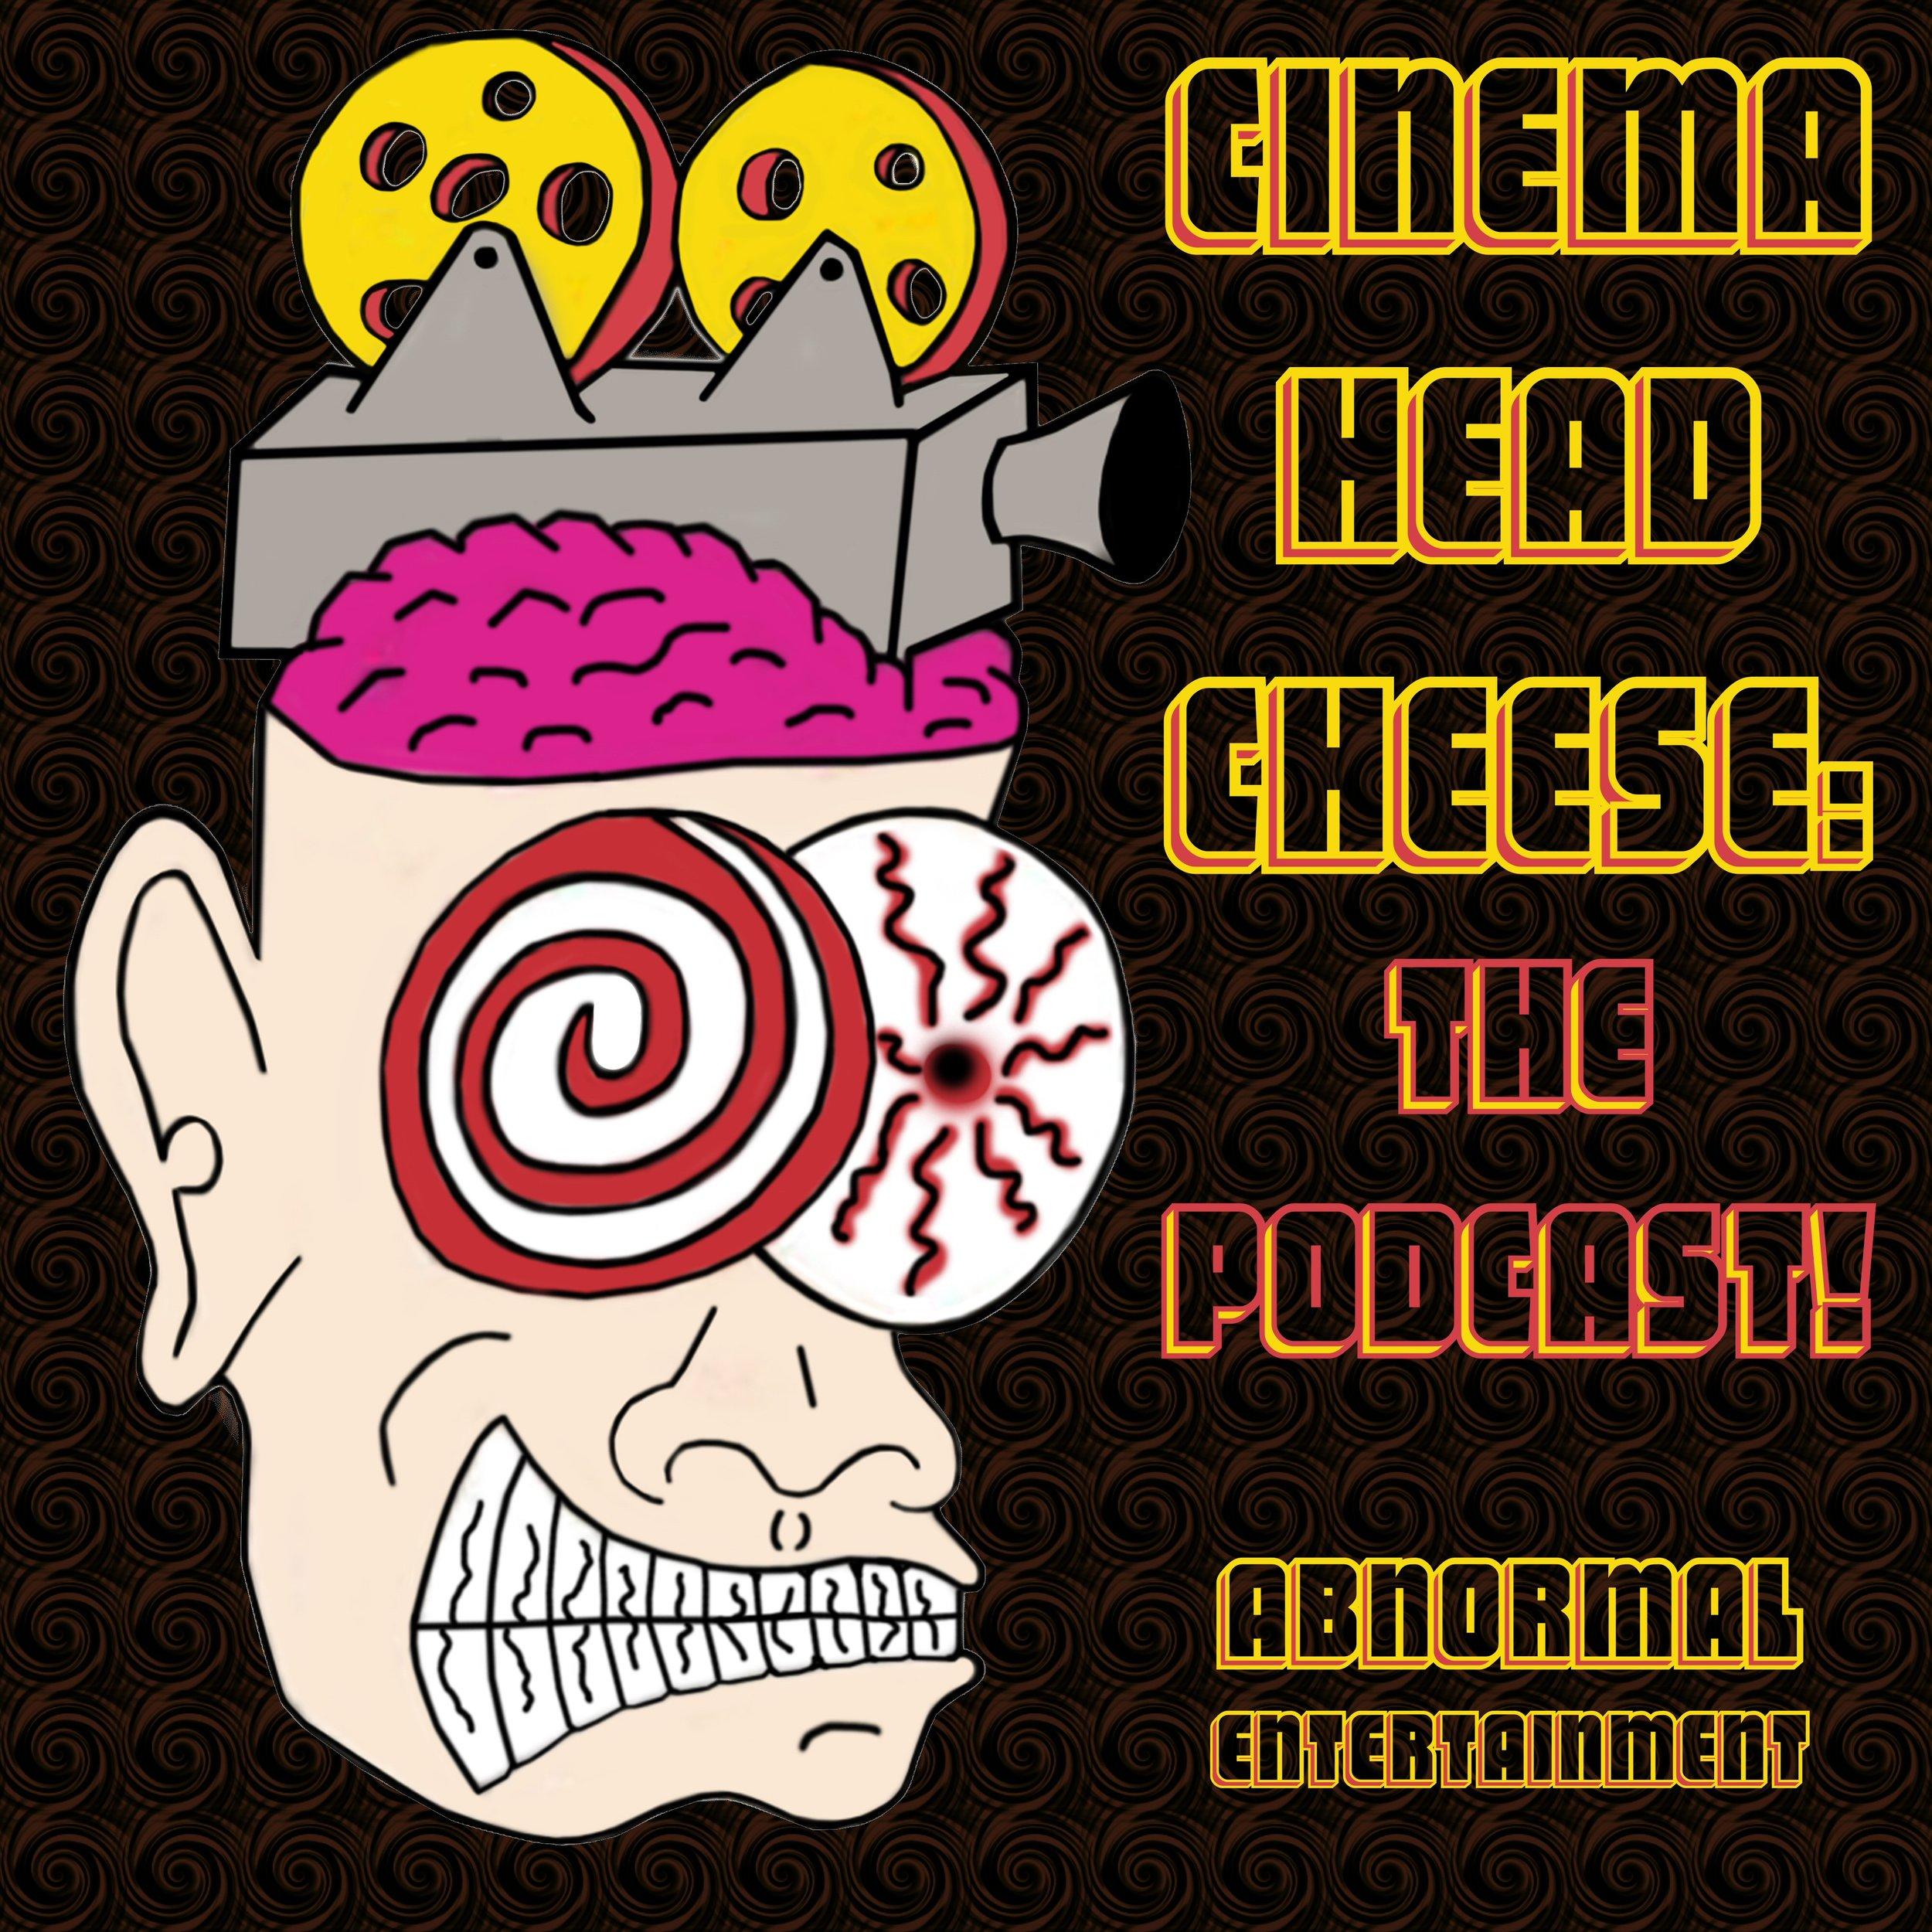 Cinema Head Cheese: The Podcast!   cinemaheadcheese.com